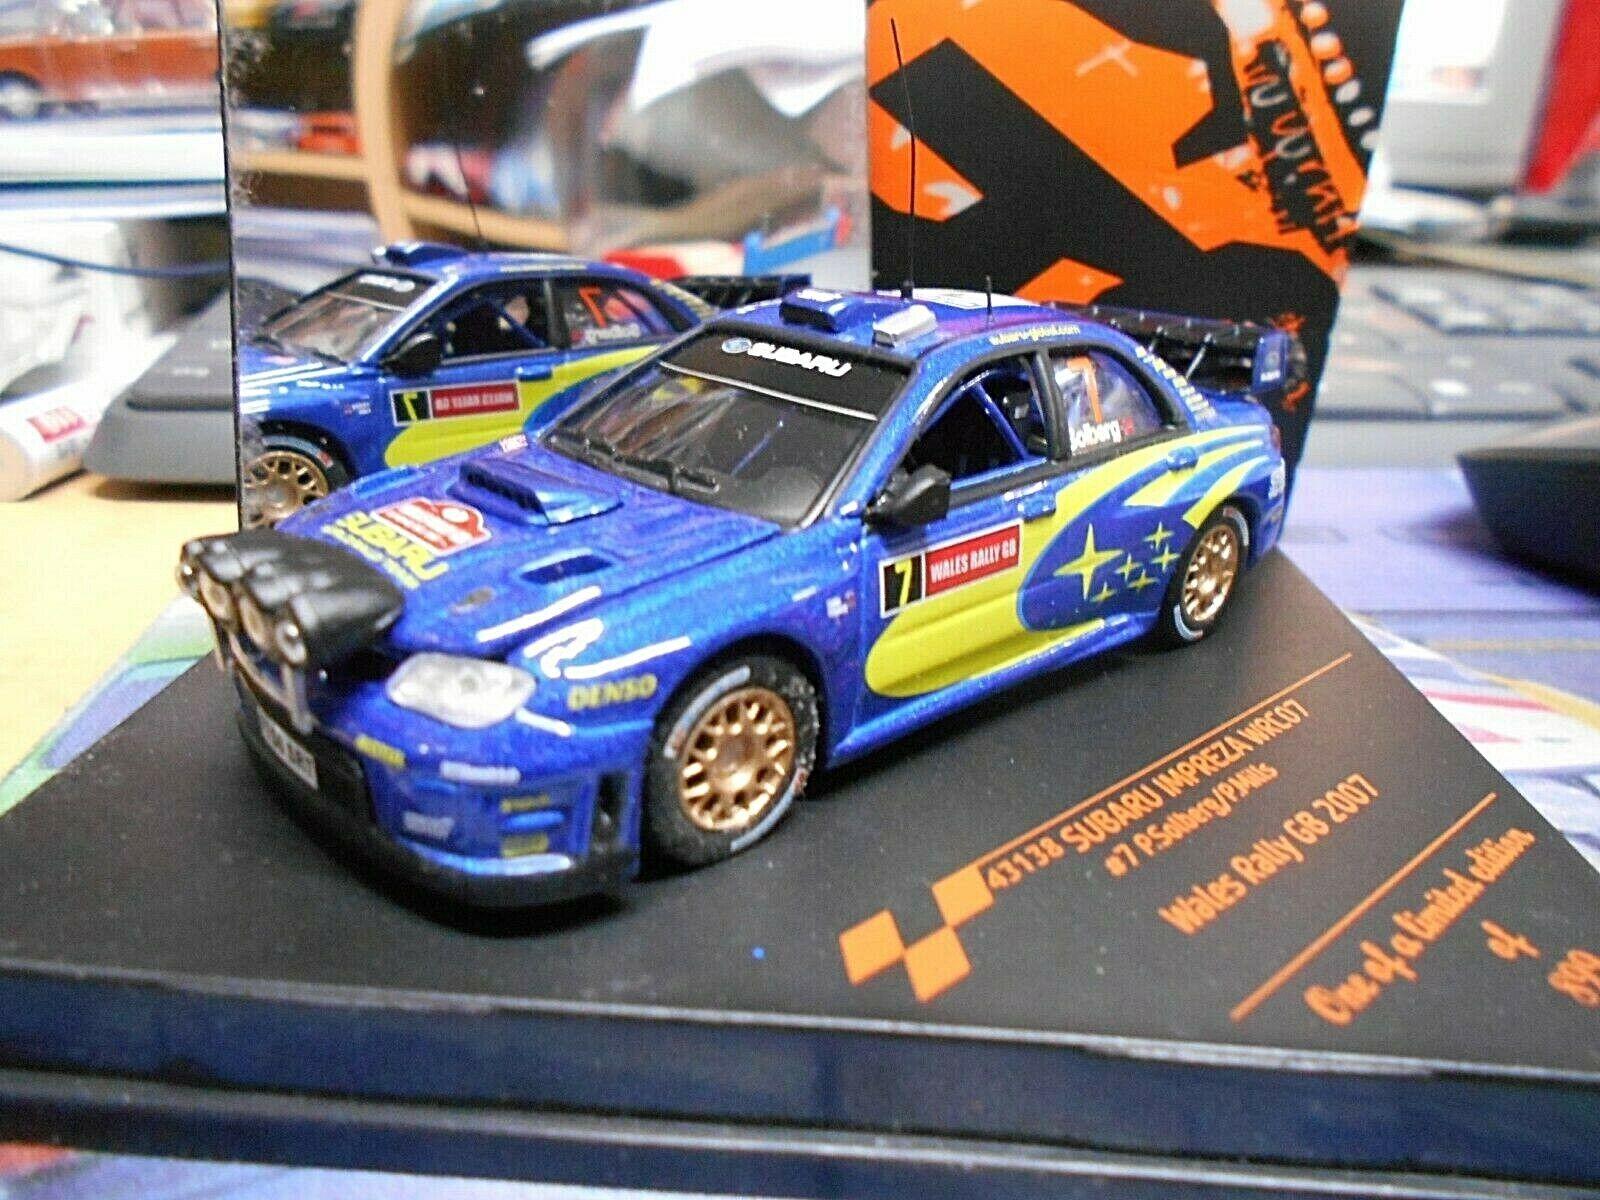 Subaru Impreza WRC Rallye 2007 WALES GB  7 Solberg NIGHTVERSION VITESSE 1 43